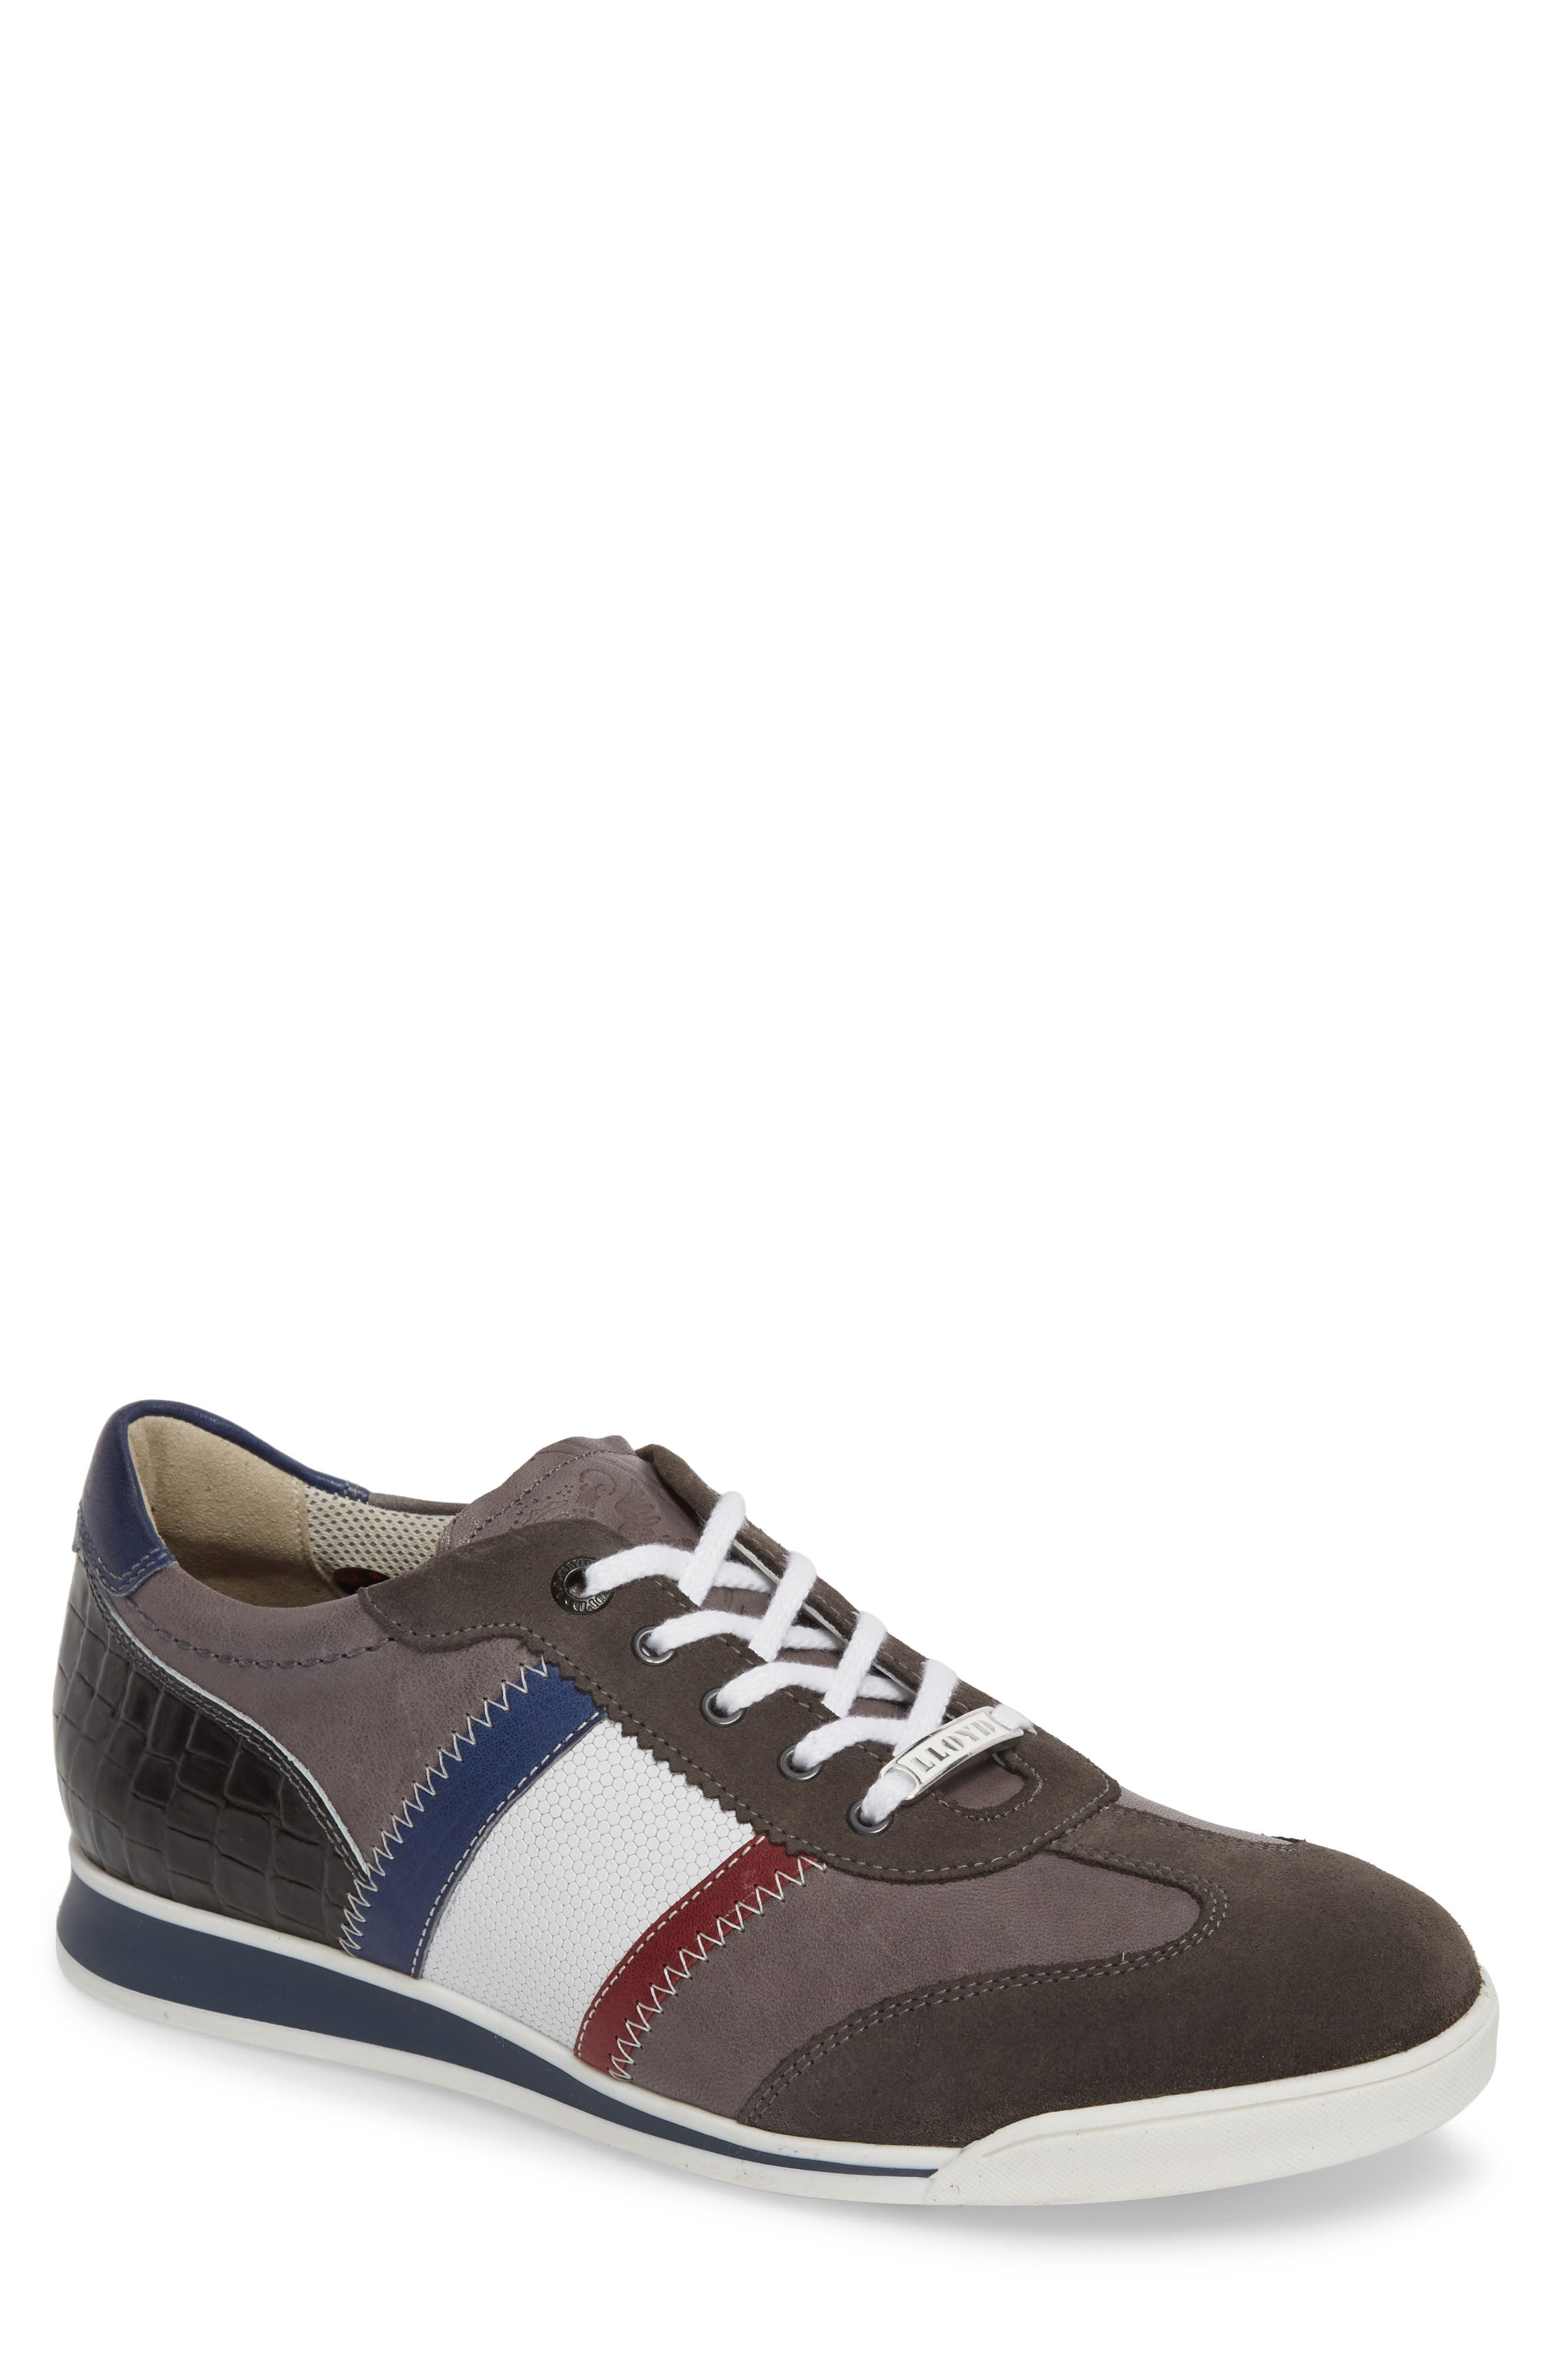 Aaron Low Top Sneaker,                         Main,                         color, Grey Leather/ Suede